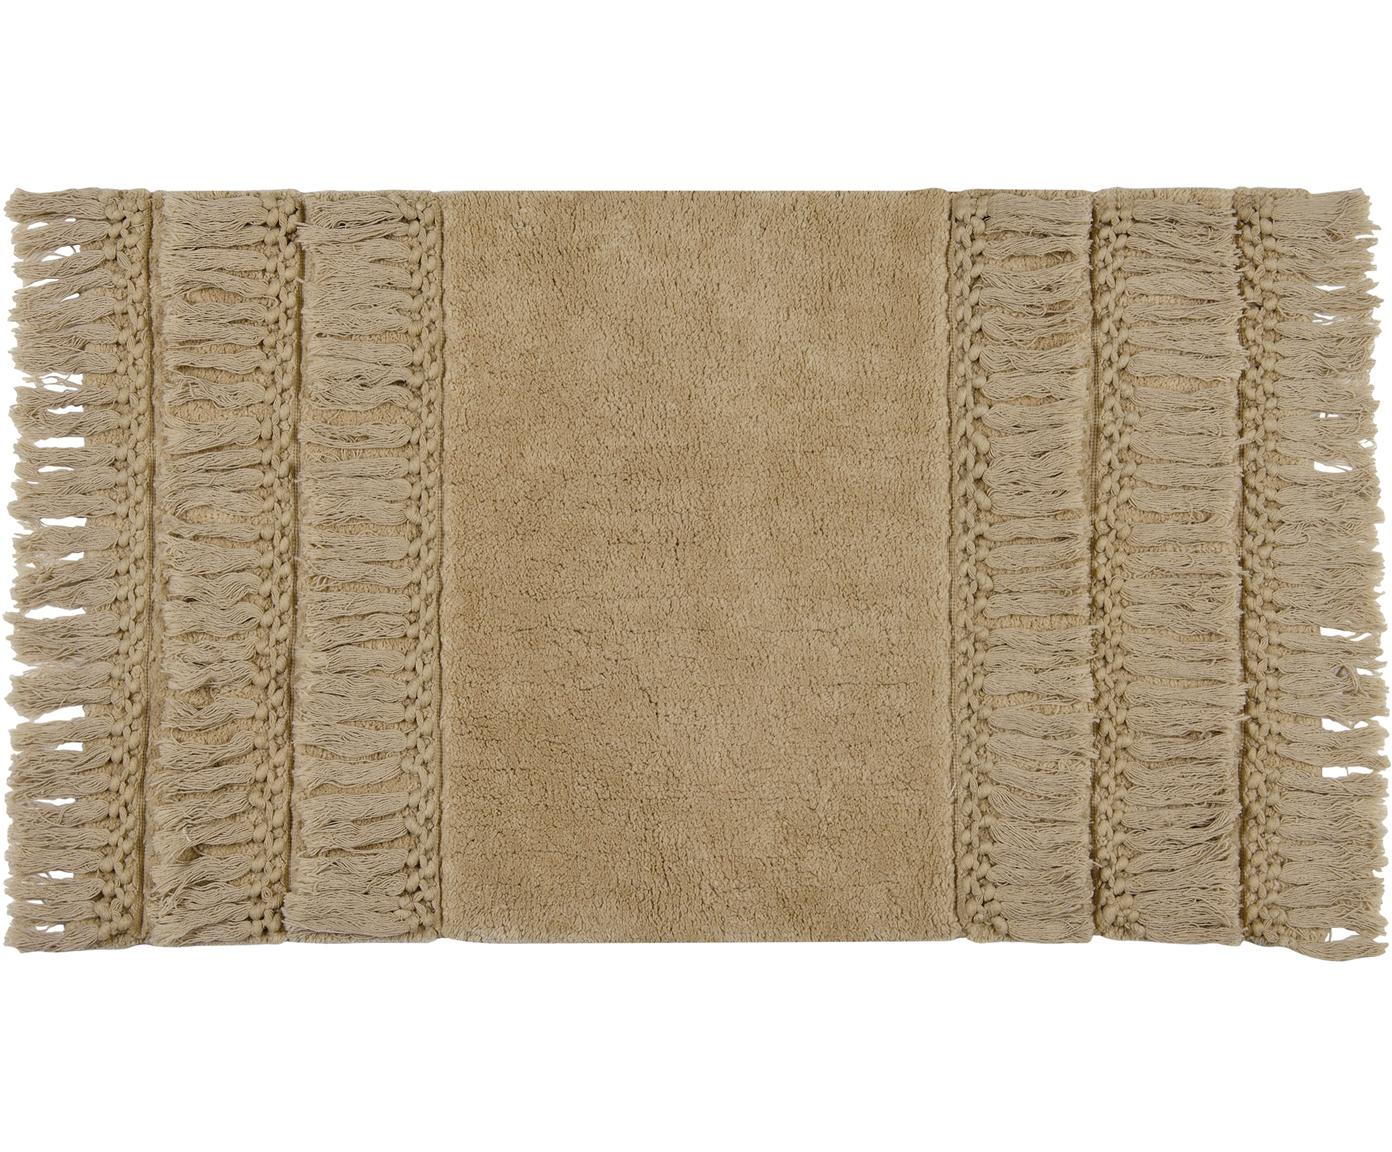 Tappeto bagno con frange Ivana, Cotone, Beige, Larg. 50 x Lung. 80 cm